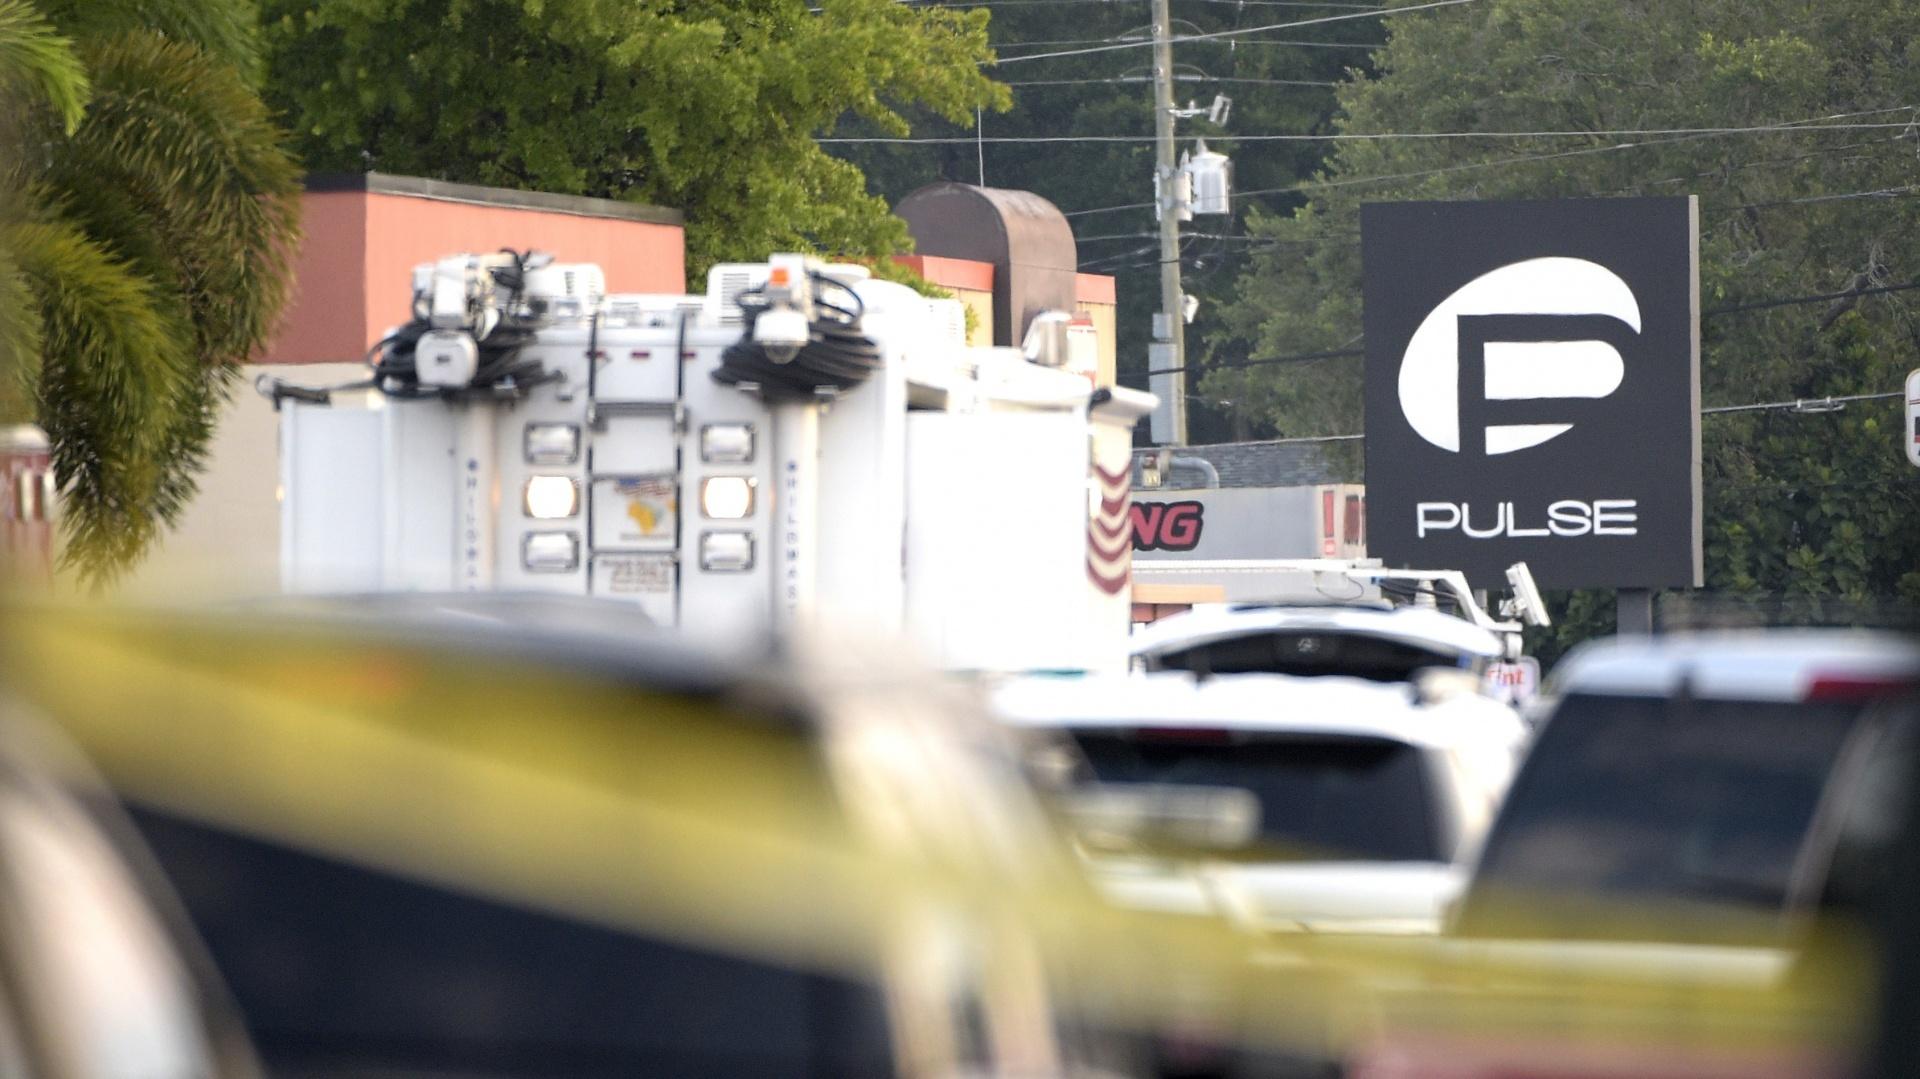 The Pulse nightclub (PA)